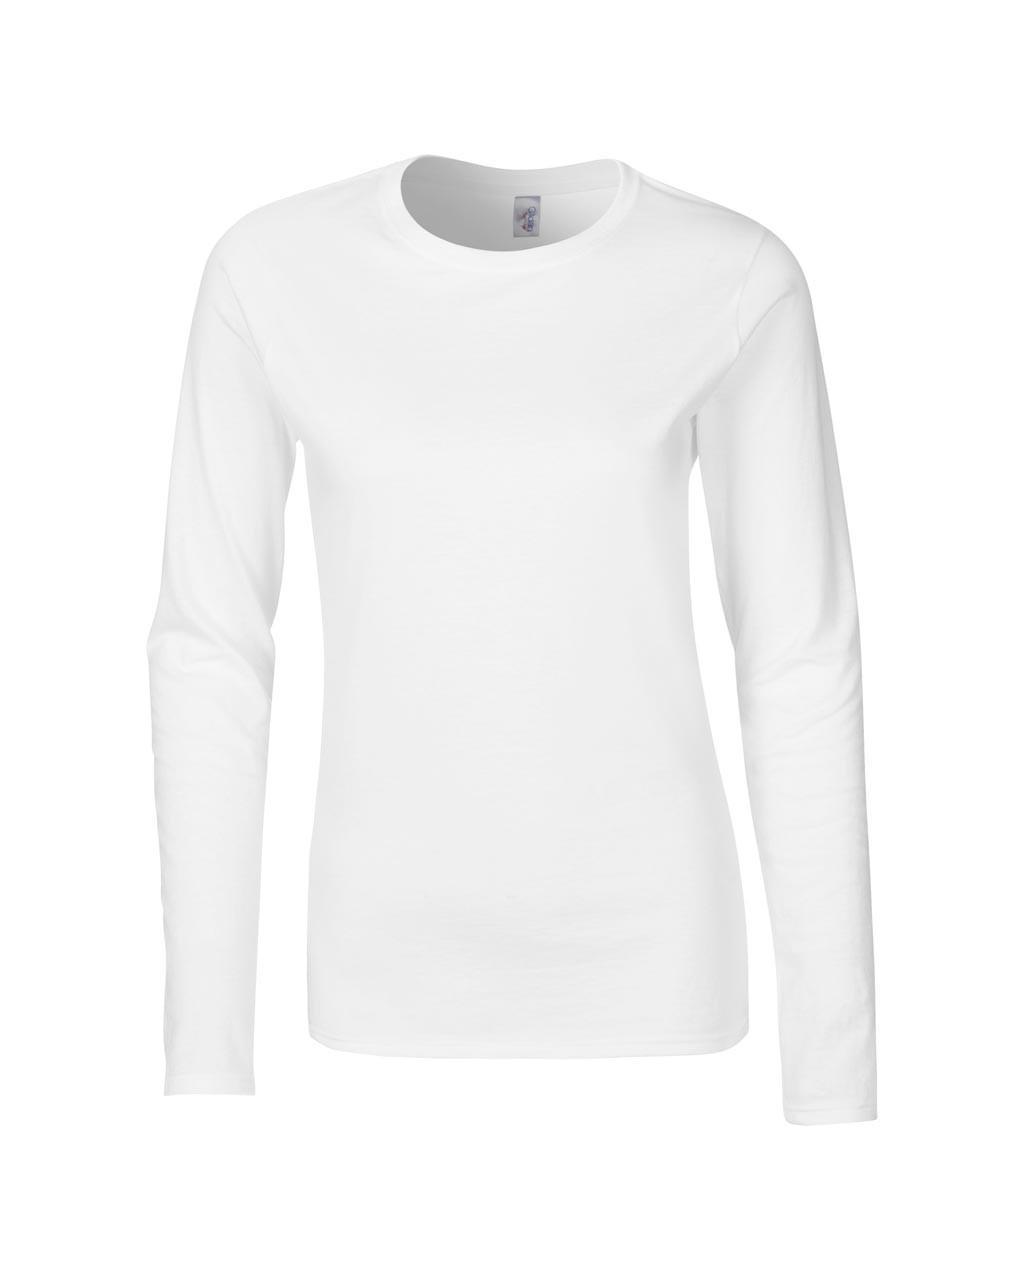 b02f284188 ... Gildan GIL64400 női hosszú ujjú pamut póló - Fehér. 1 ...